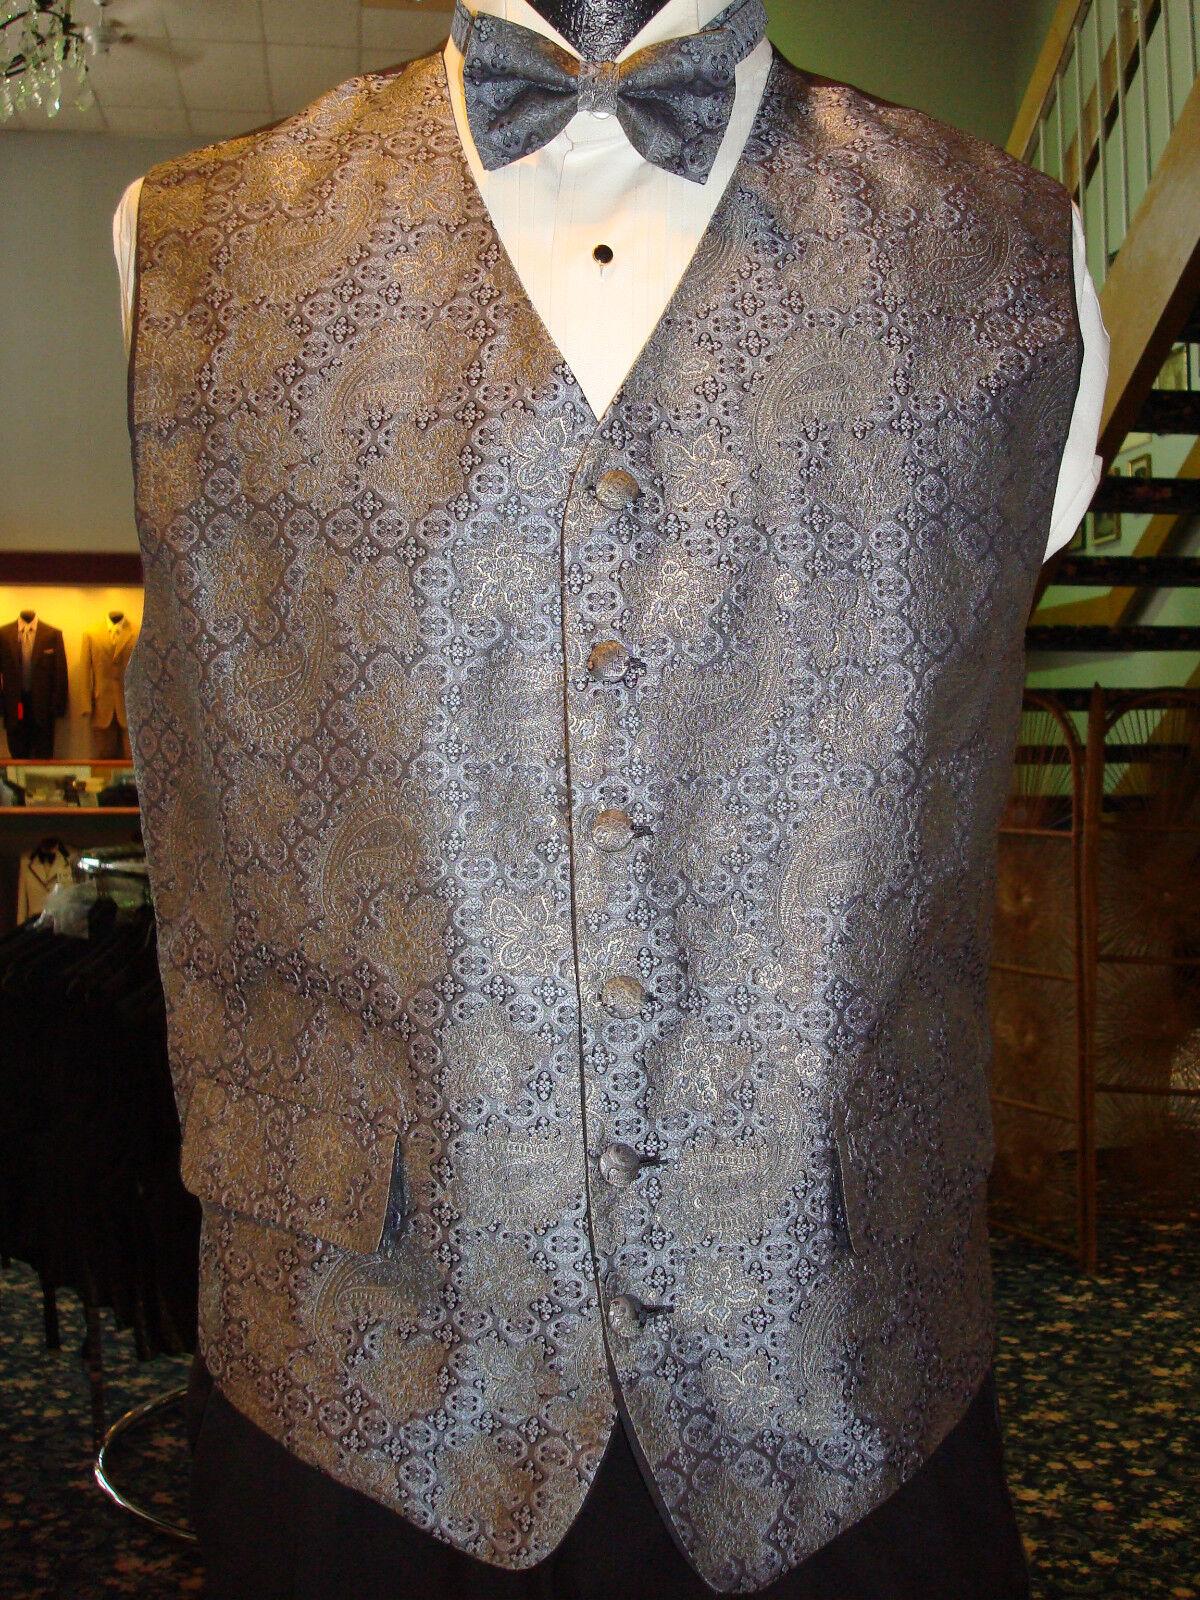 Periwinkle & Gold Paisley Pattern Formal Vest w Bow & Hanky - Fullback - Mens M